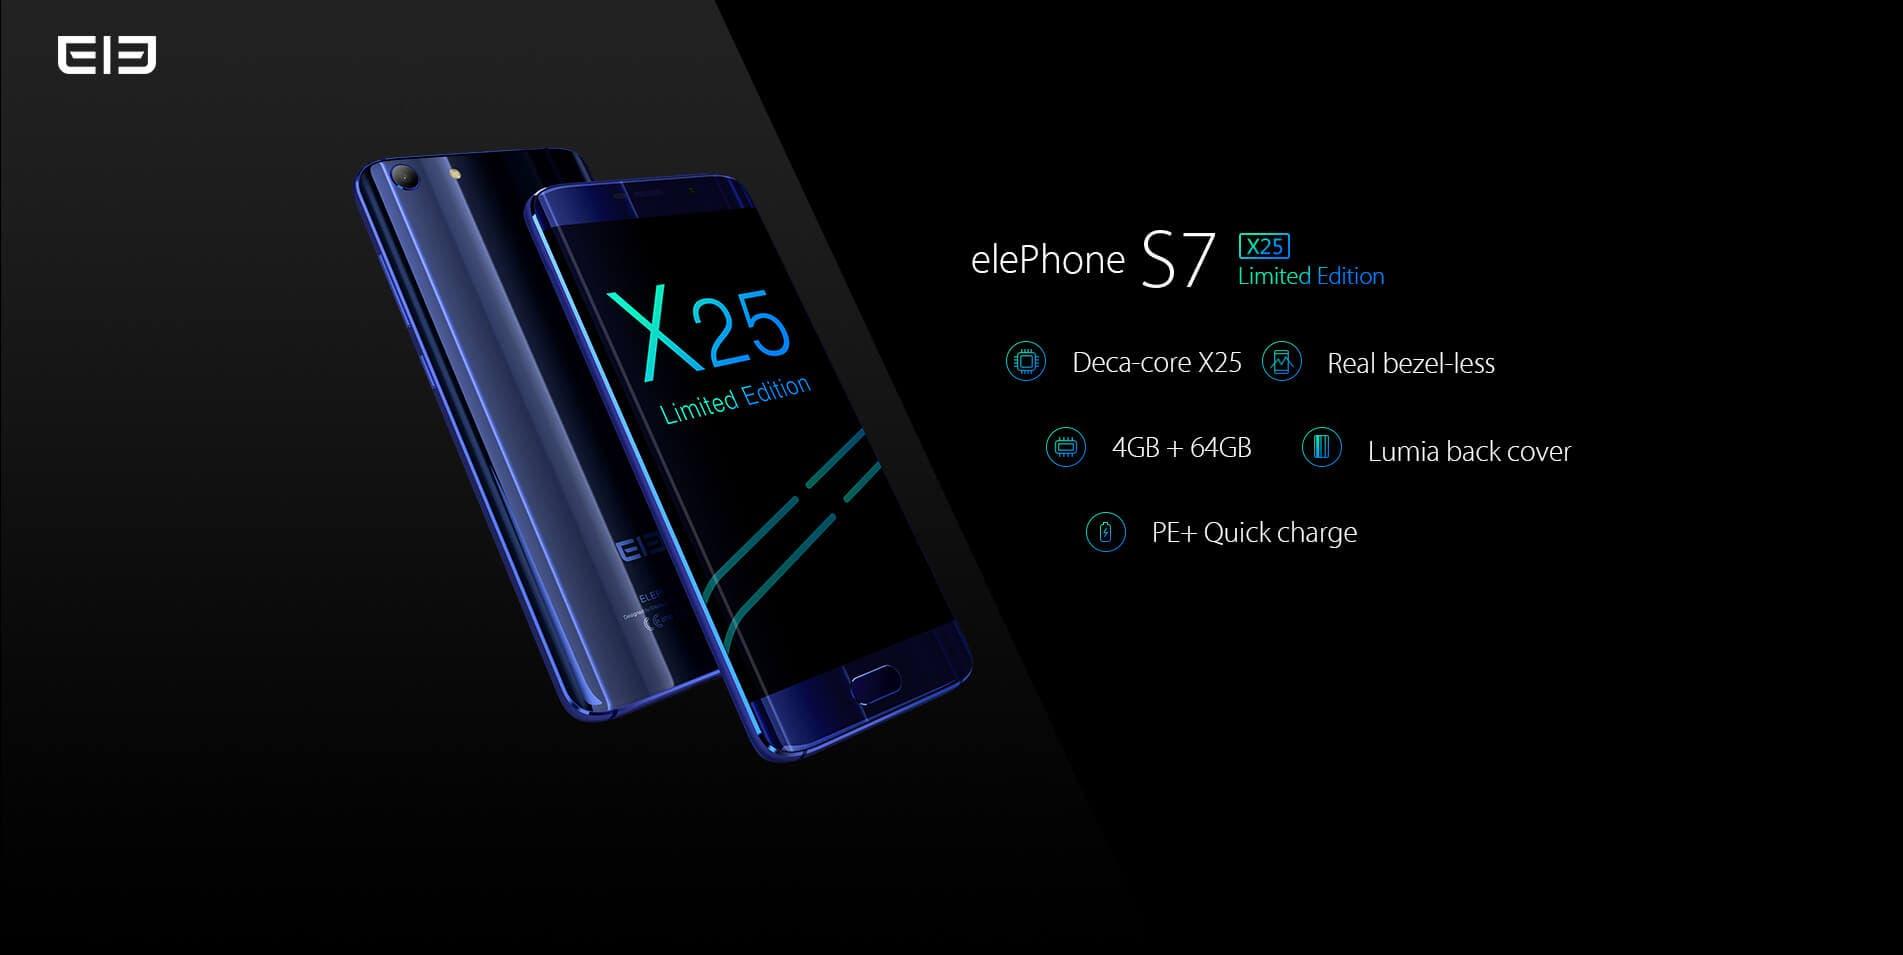 Elephone S7 Treasure Limited helio X25